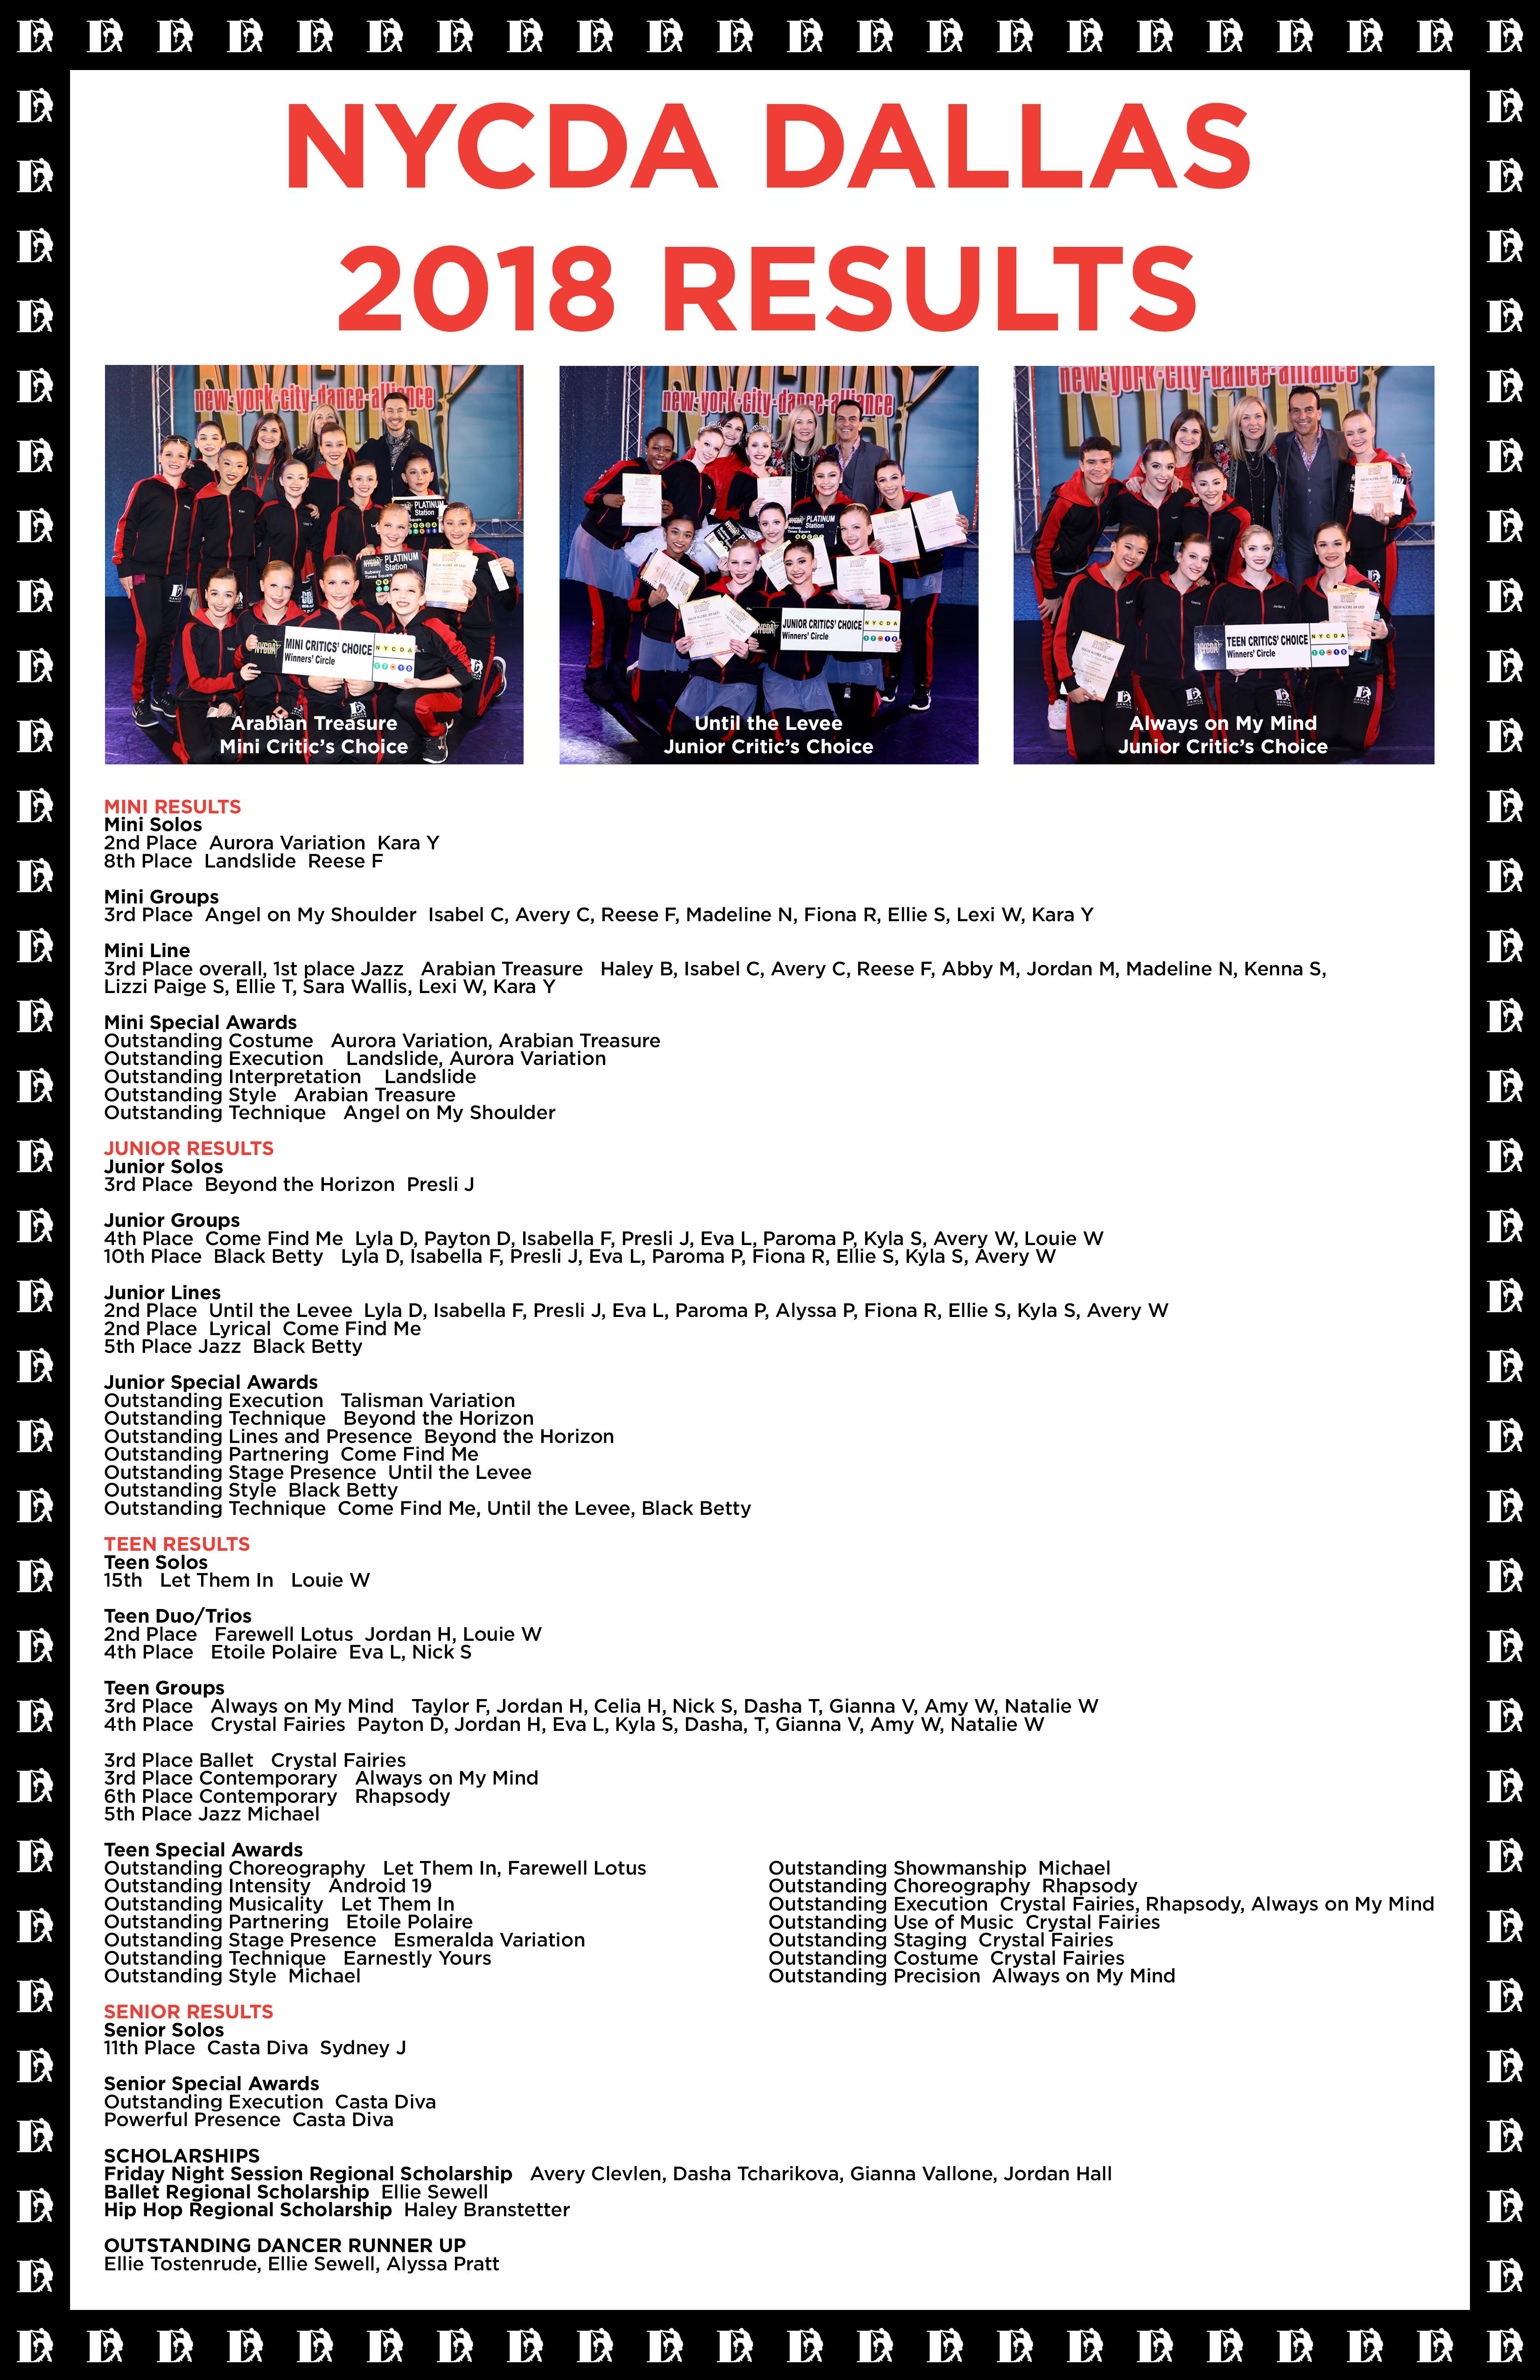 NYCDA Critics Choice 2018 Results